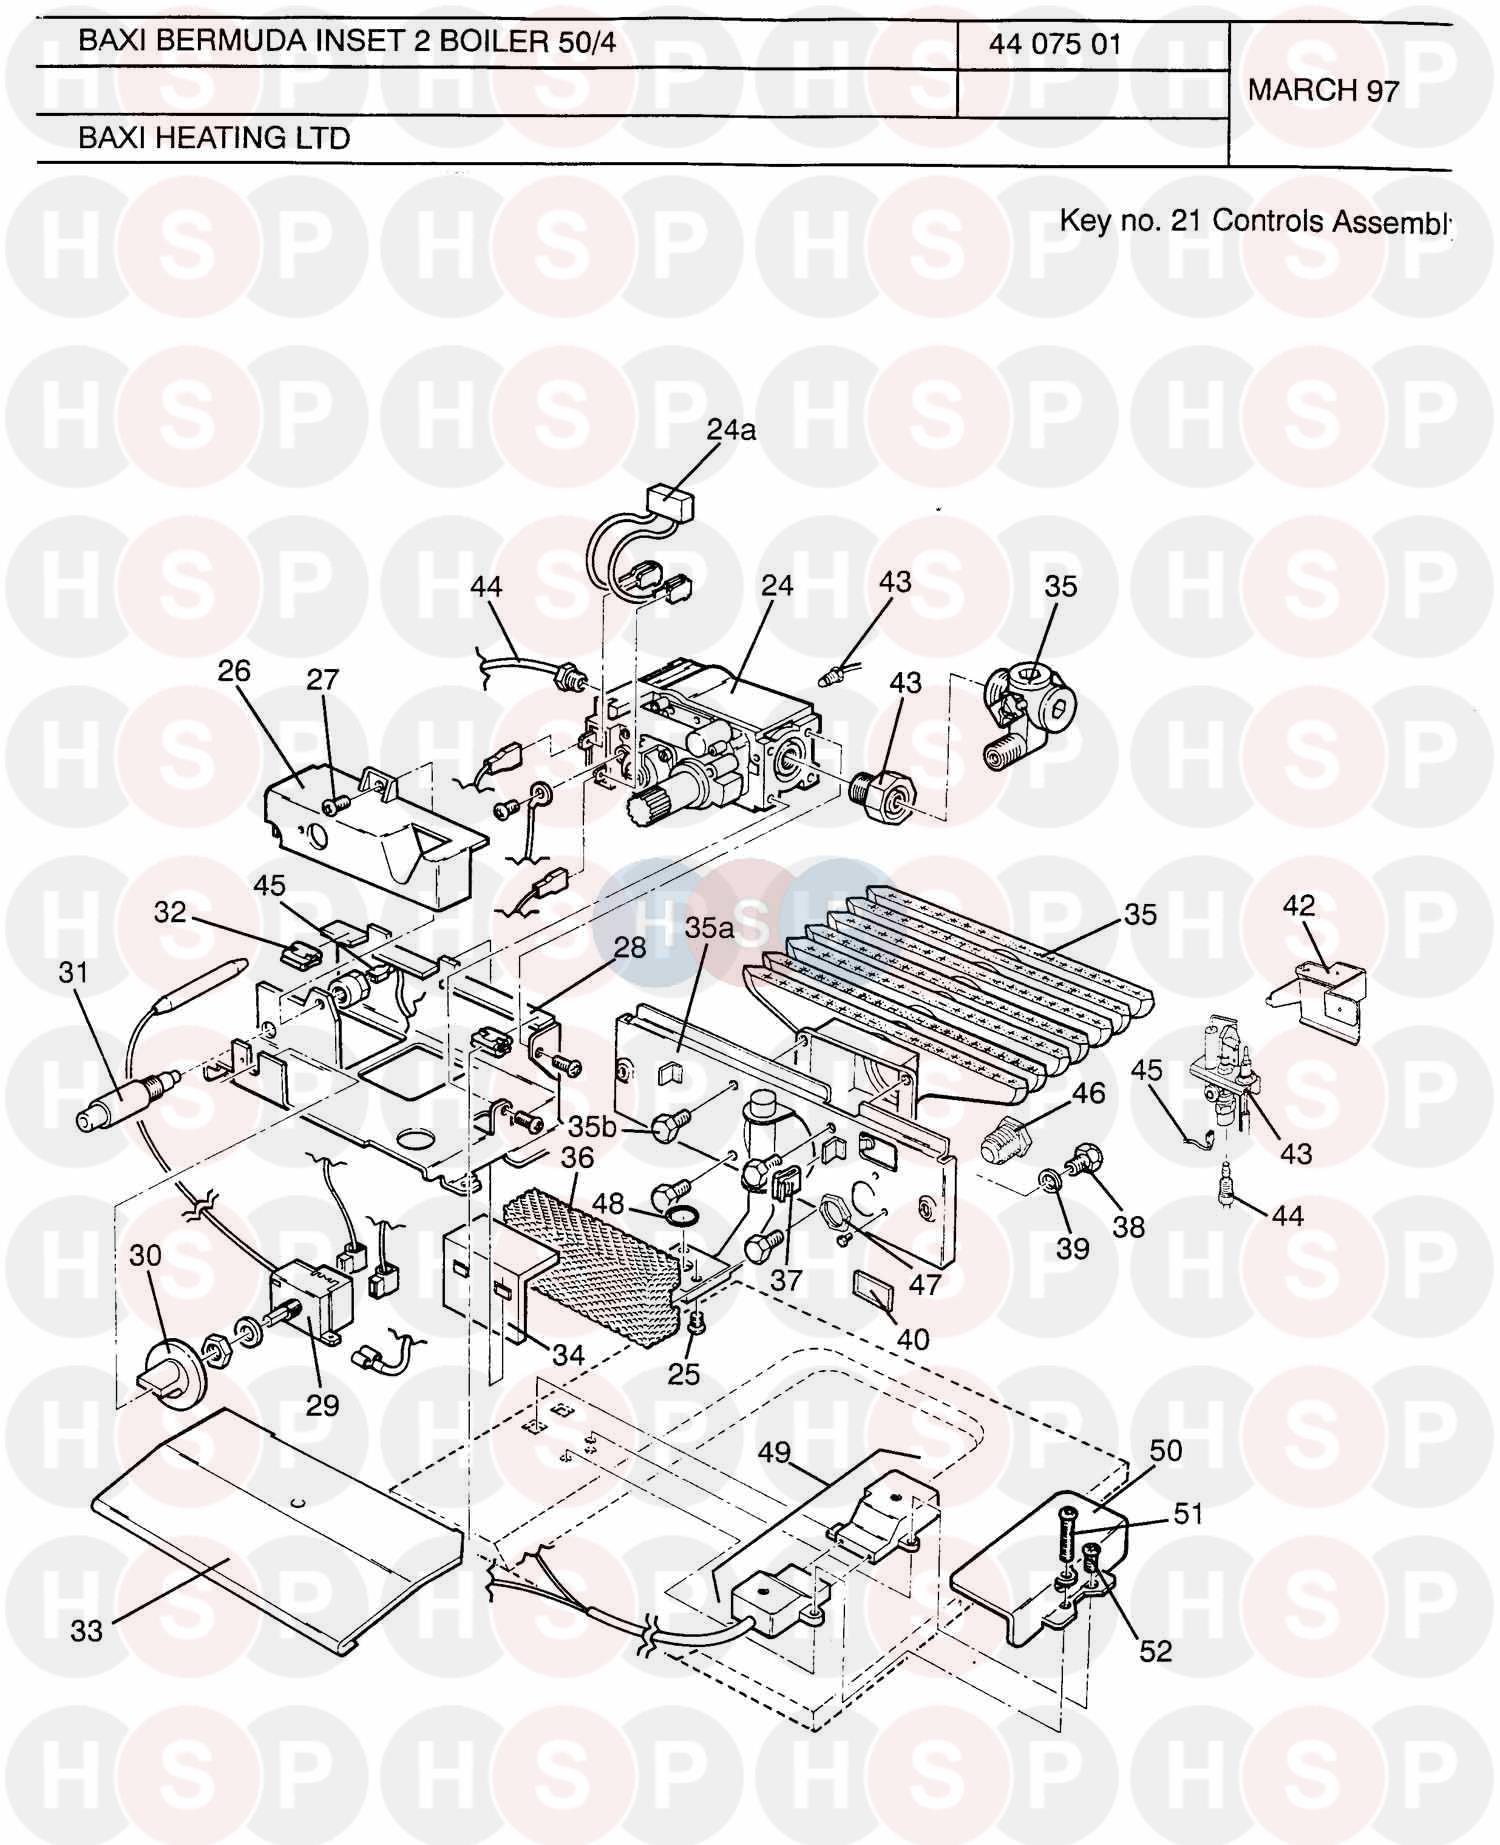 Baxi BERMUDA INSET 50/4 ASD (Controls Assembly) Diagram